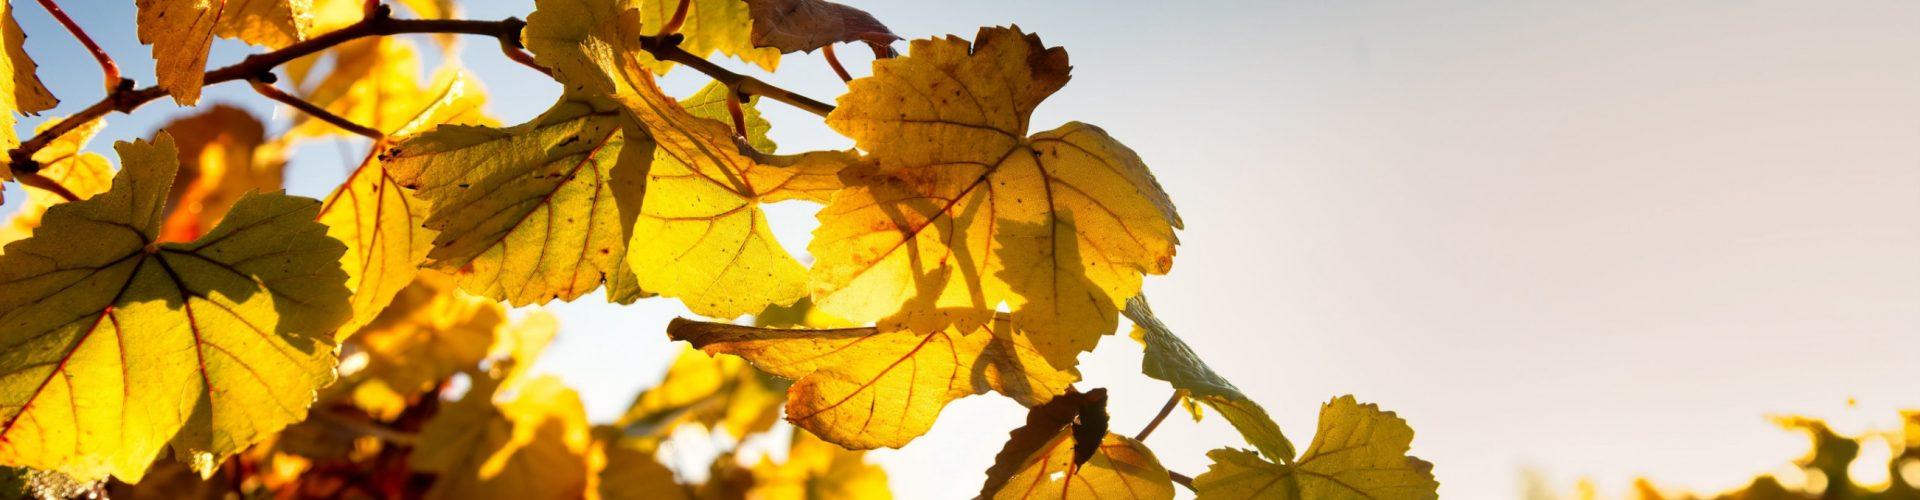 Photo leaves 2x